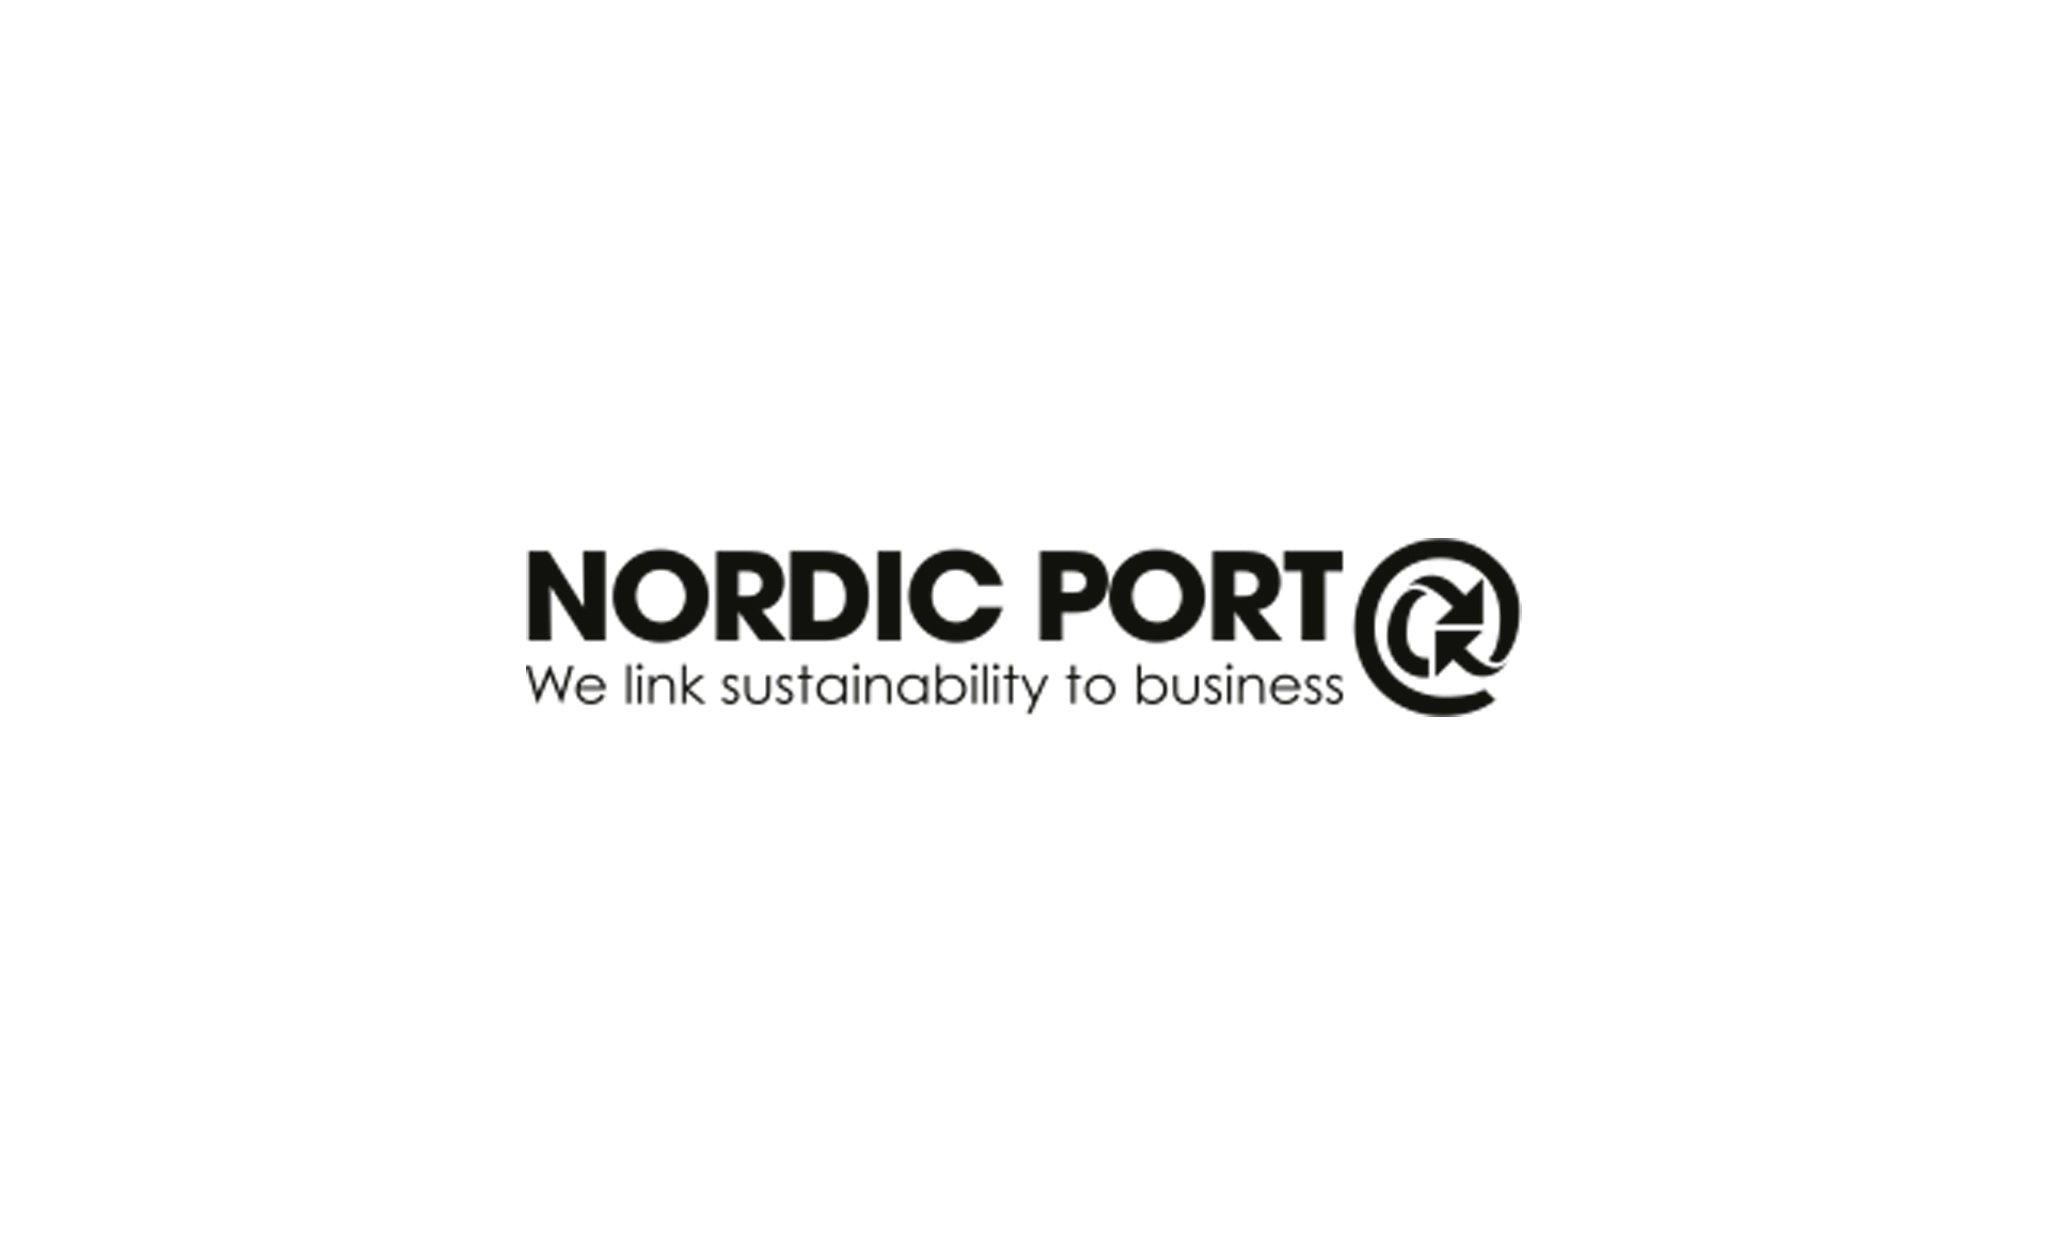 Logo of Nordic Port